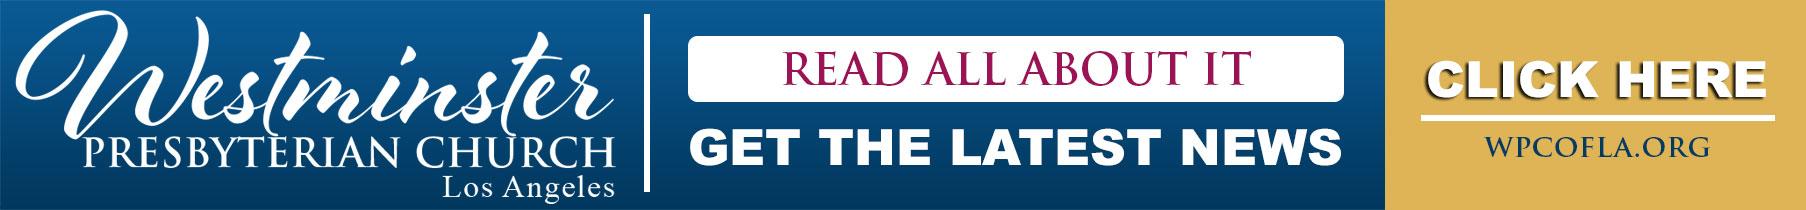 NEWS: Get Westminster Presbyterian Church News & Events